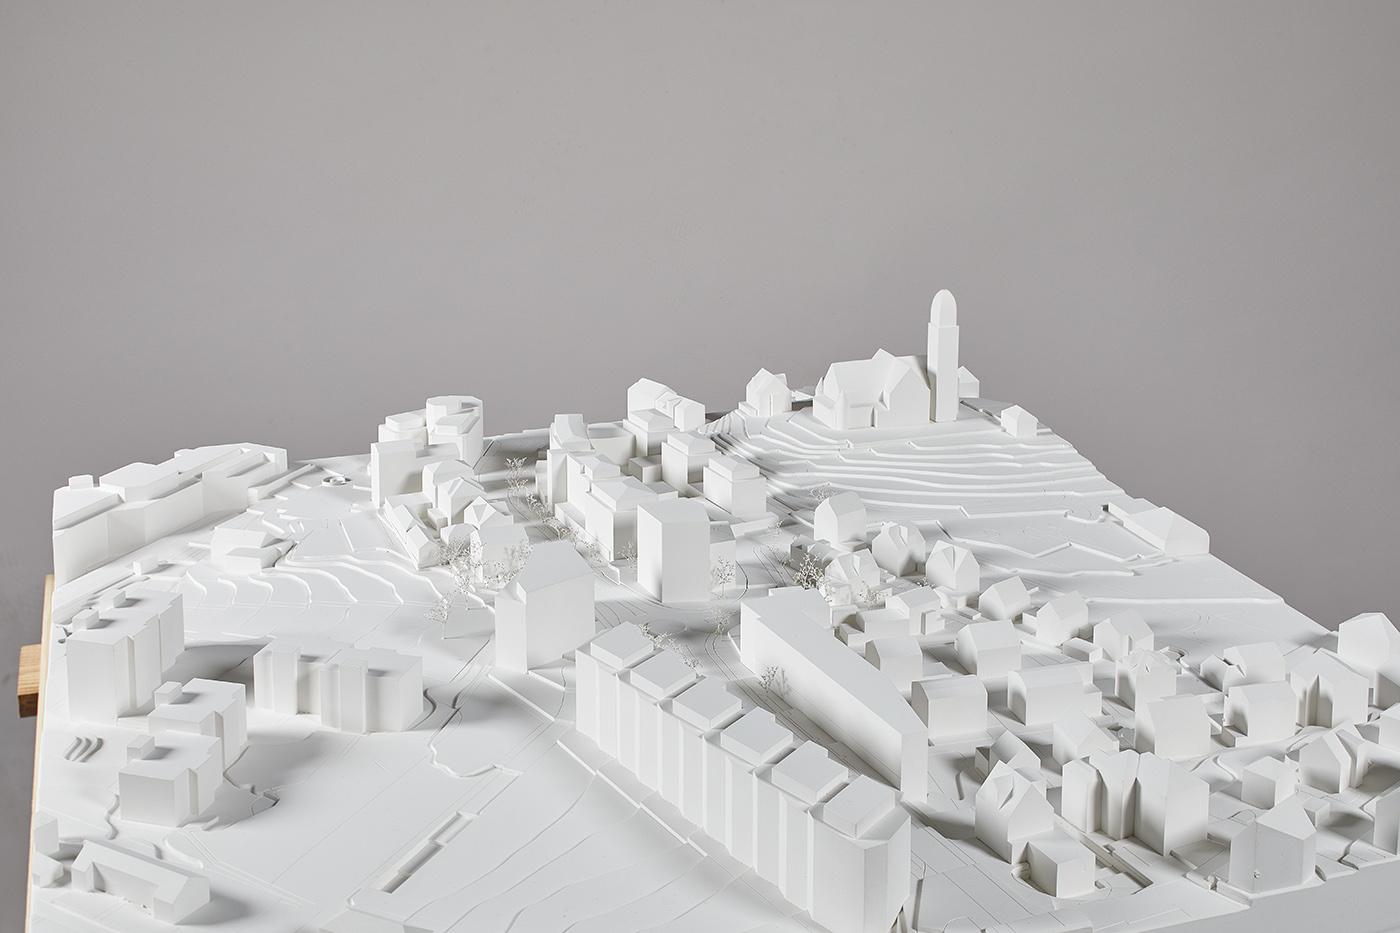 buan architekten – Studienauftrag Kanzlei-Kreisel Emmenbrücke – Situationsmodell 1